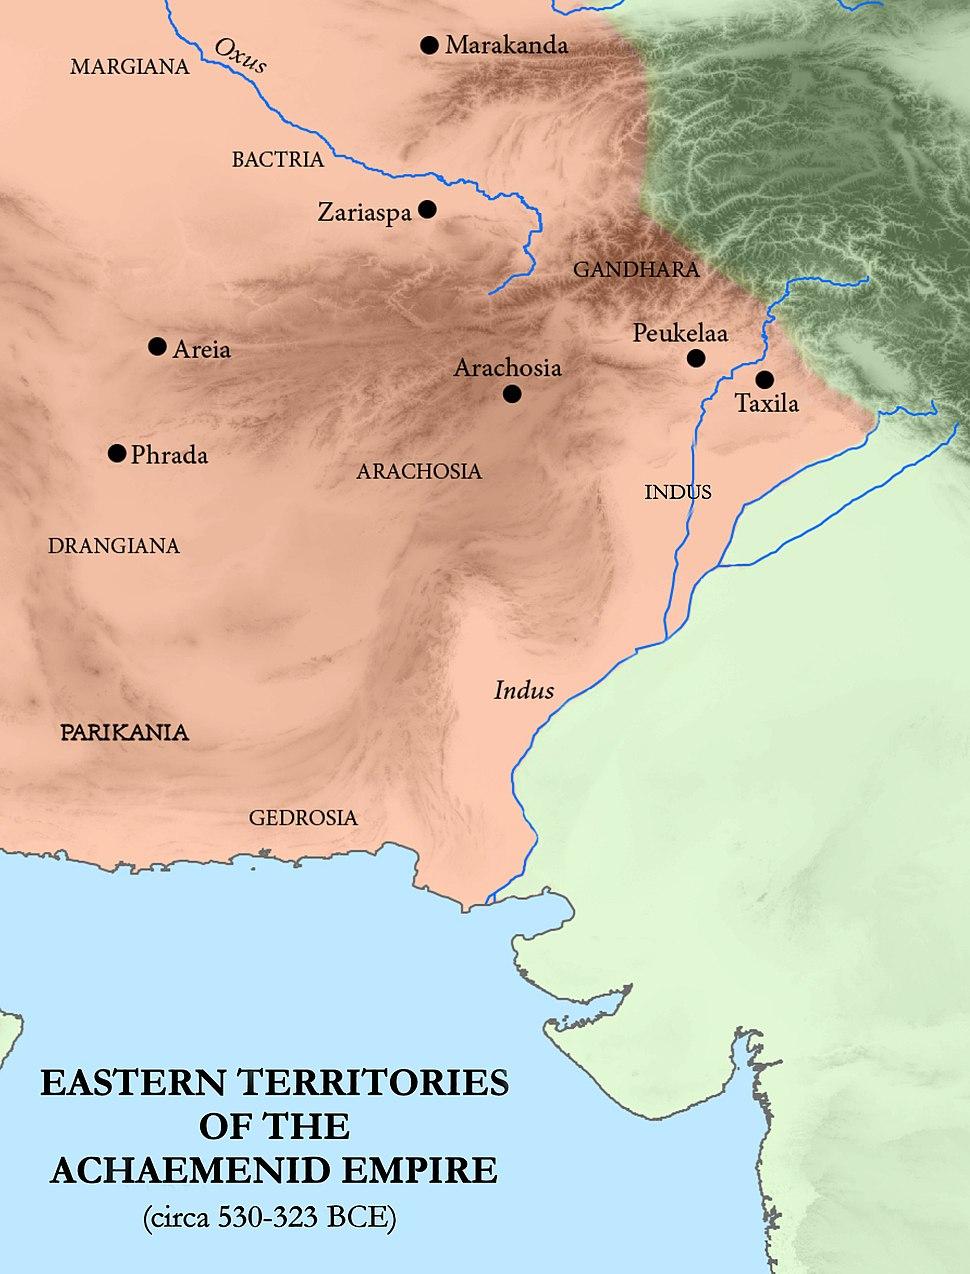 Eastern Satrapies of the Achaemenid Empire